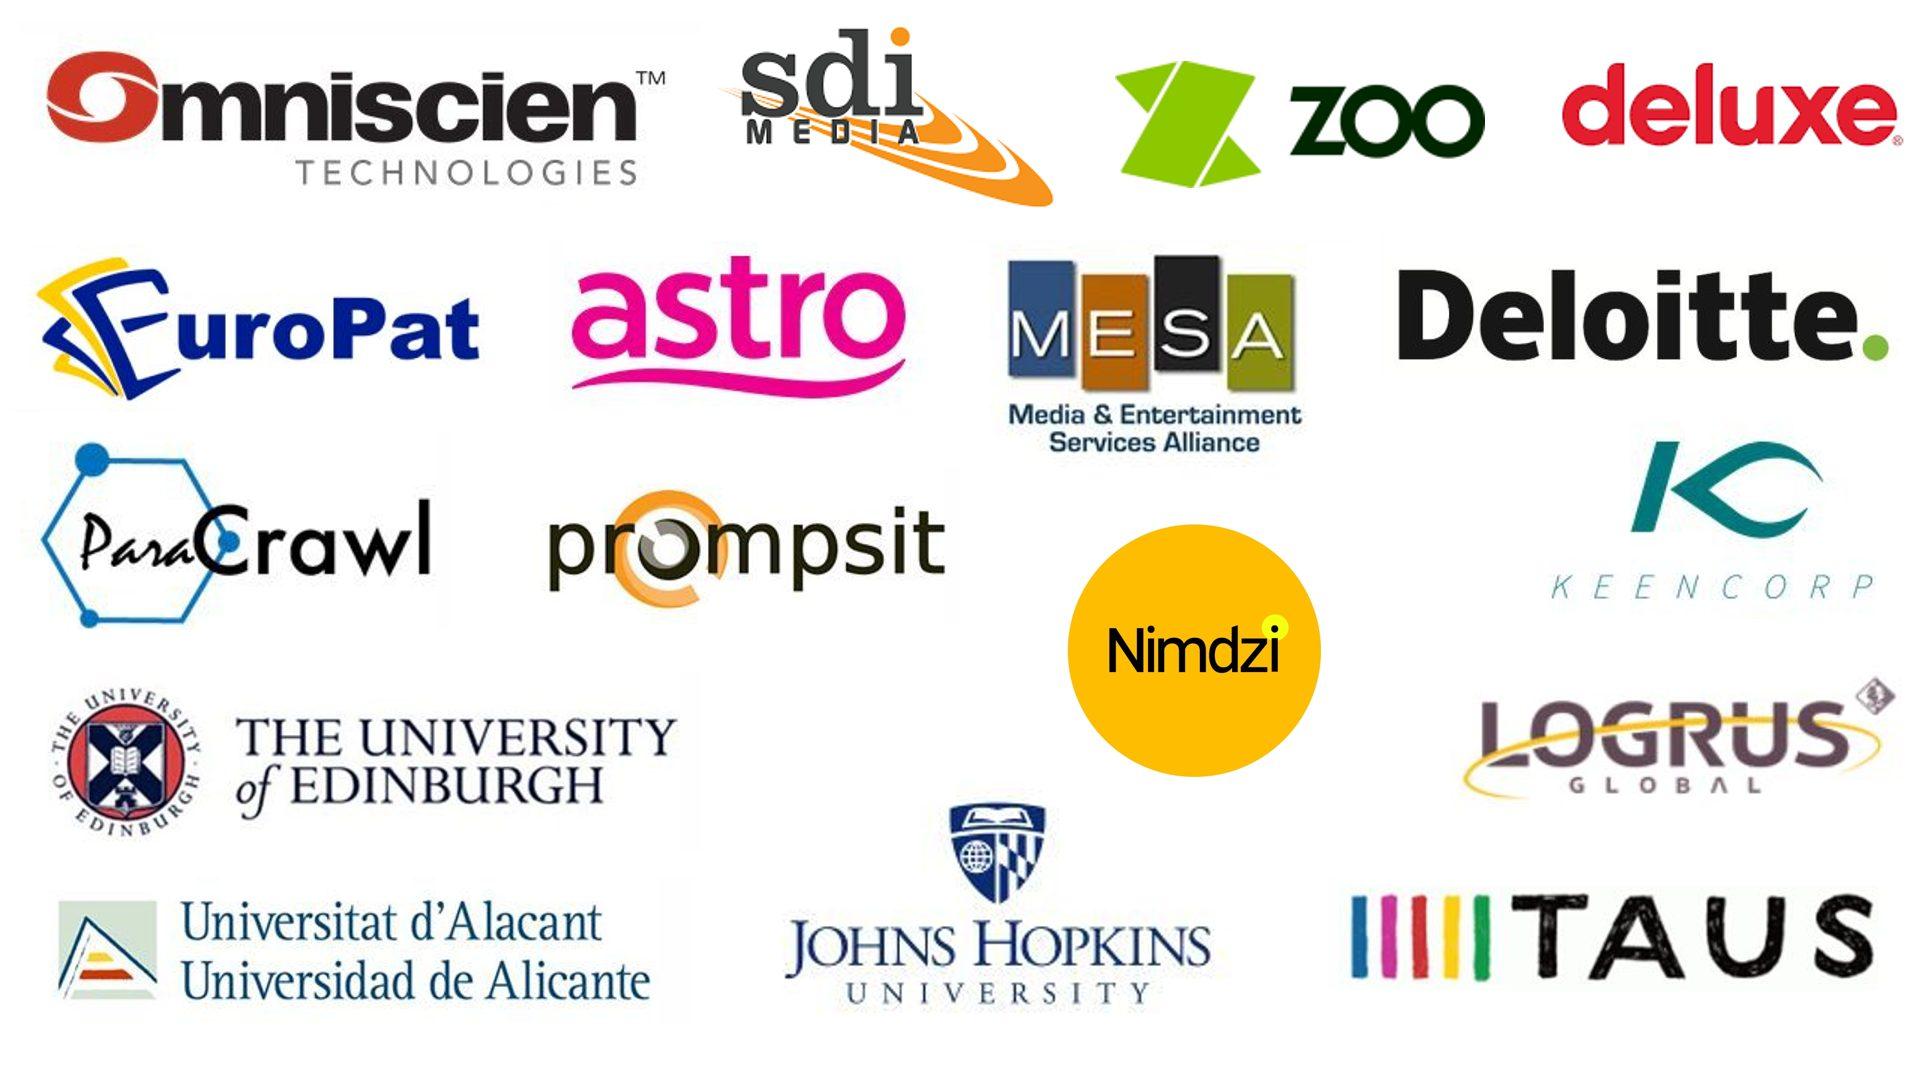 Symposium Speaker Company Logos